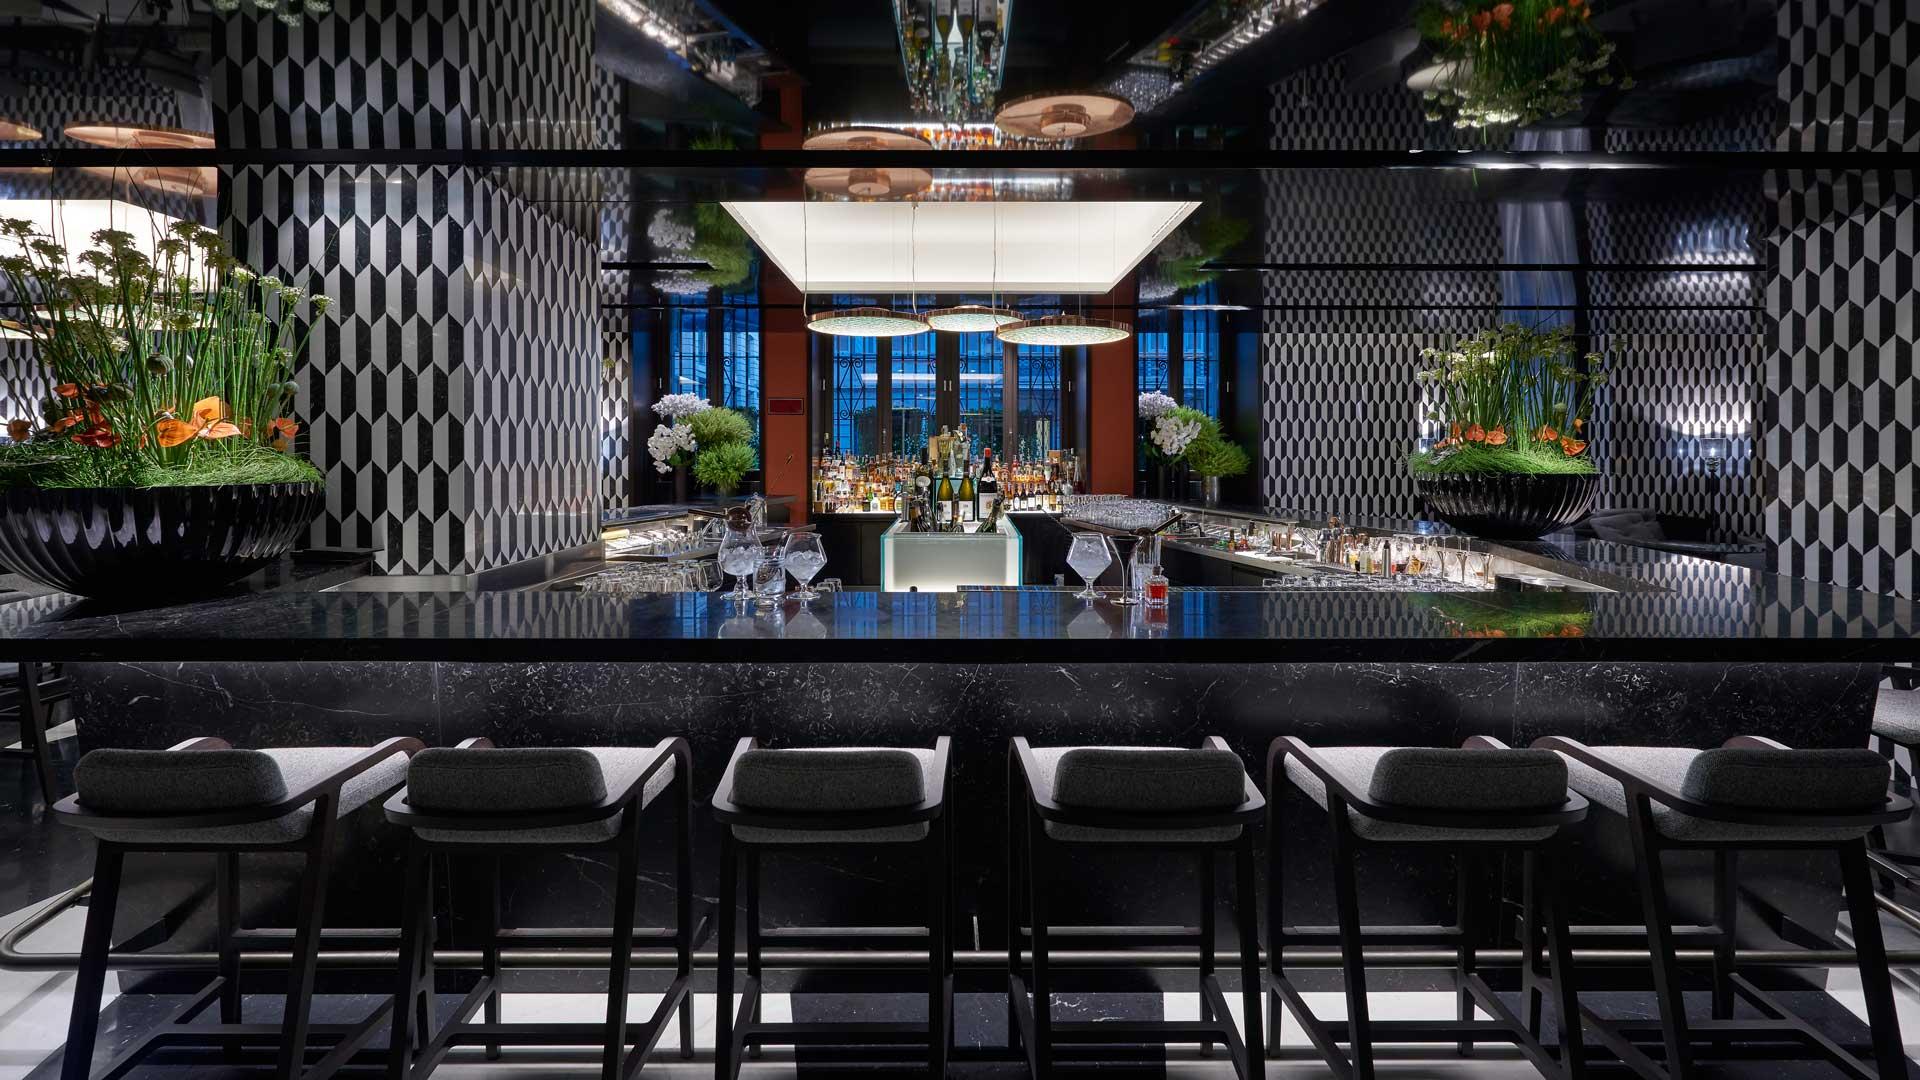 Mandarin-bar-bistro-Mandarin-Oriental-Coqtail-Milano